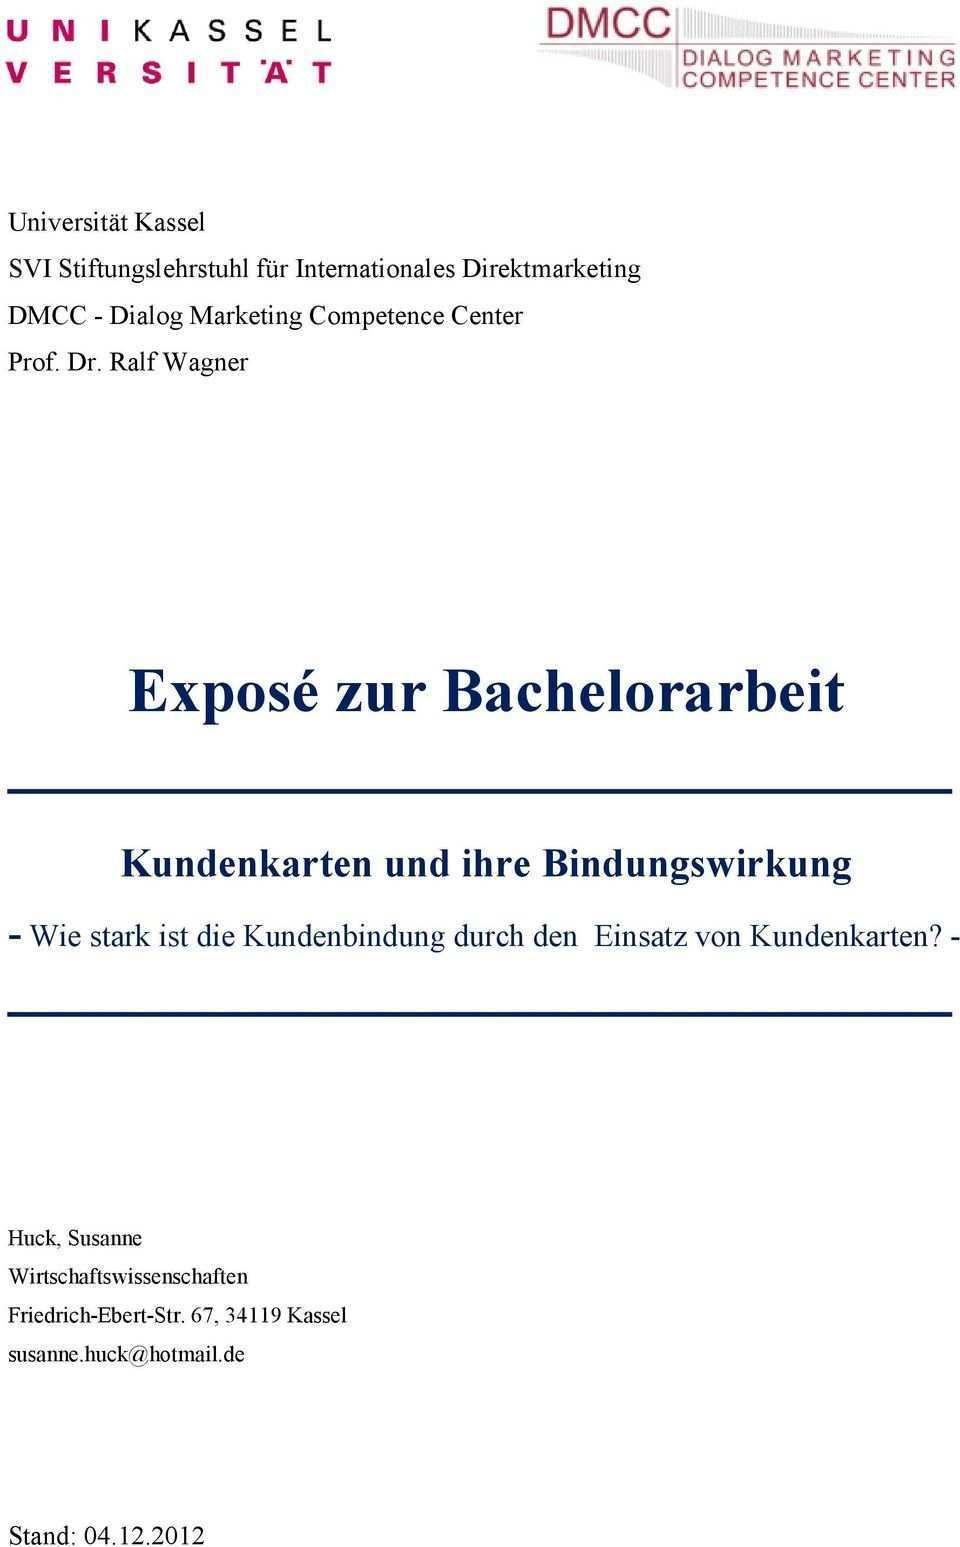 Expose Zur Bachelorarbeit Pdf Free Download